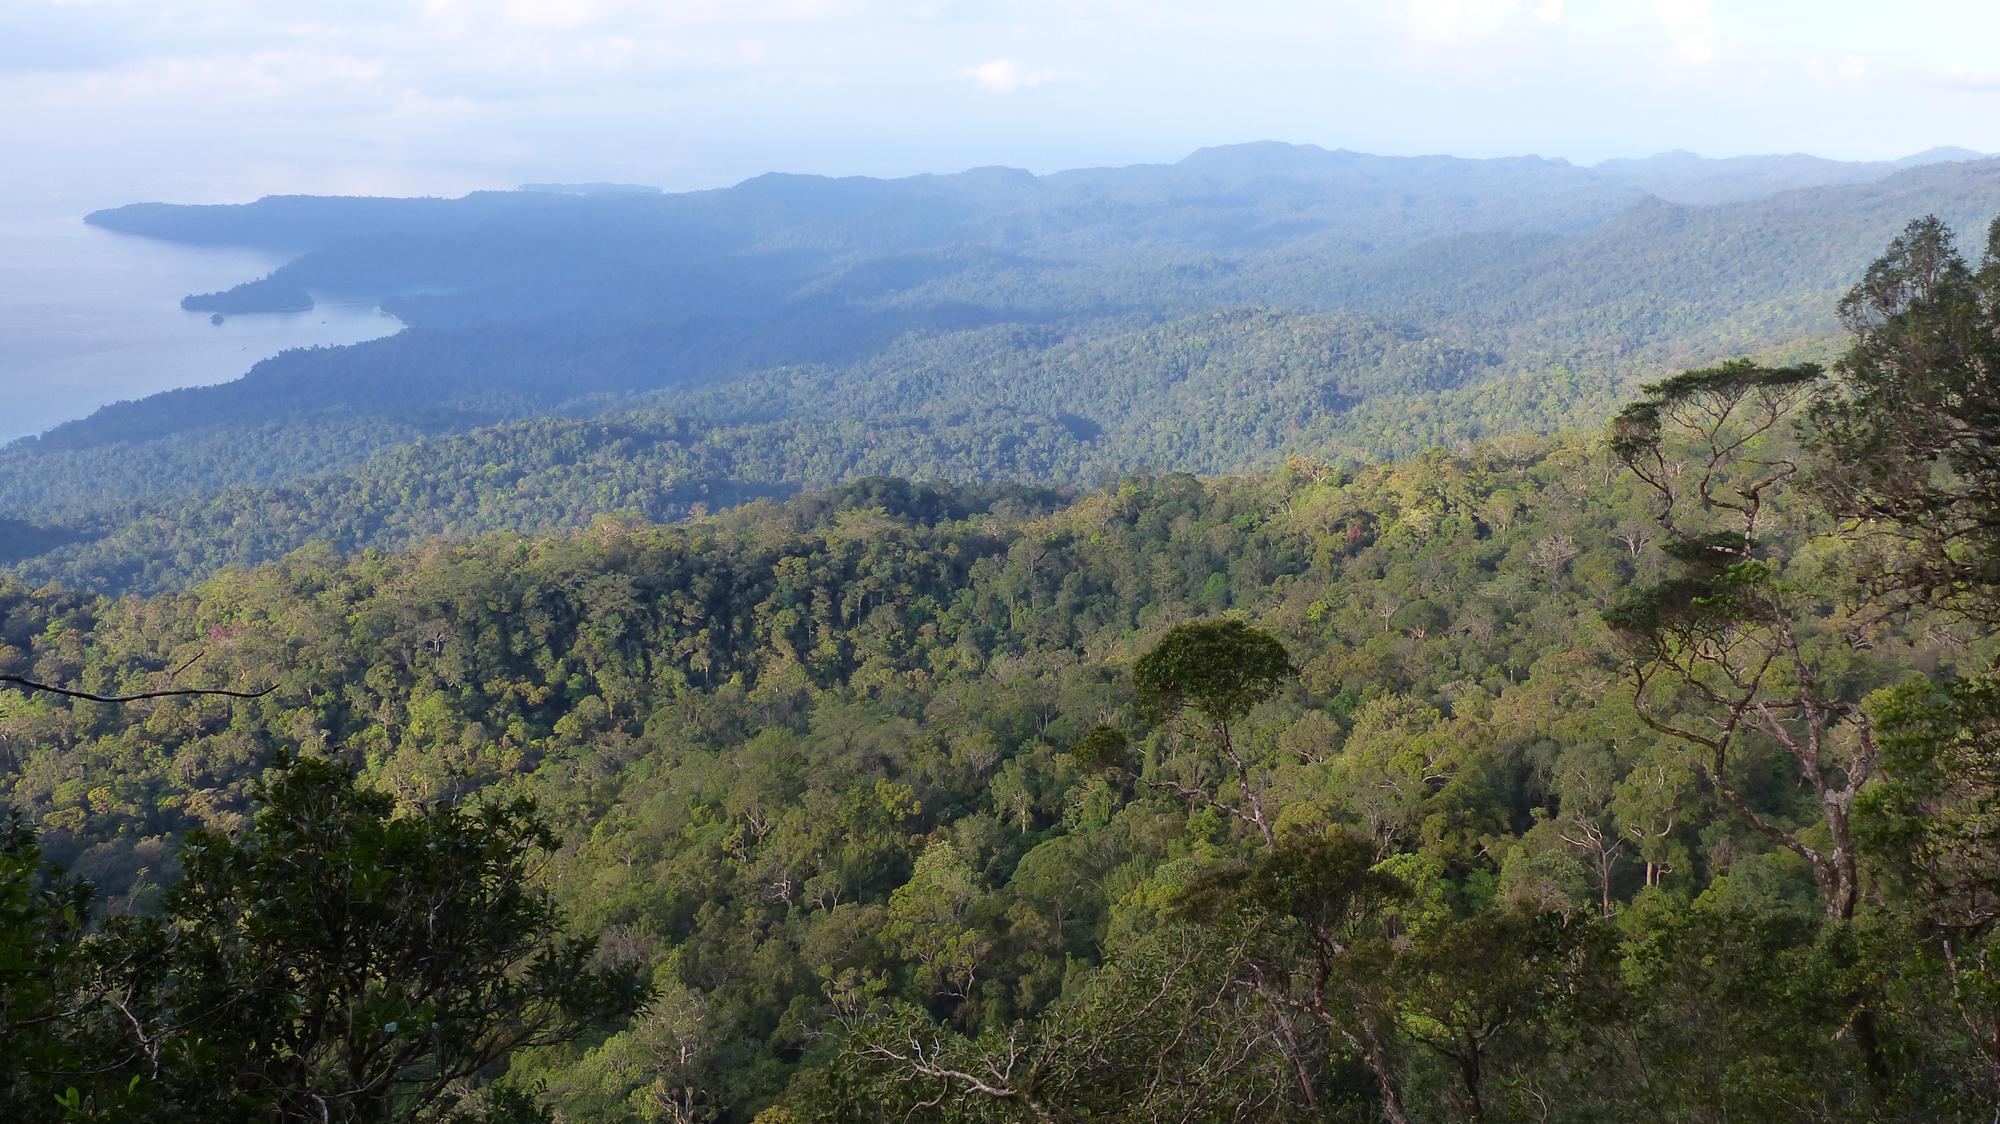 Vista de las montañas Kumawa desde el campamento situado a 1100 m. Imagen: Christophe Thébaud / MNCN-CSIC